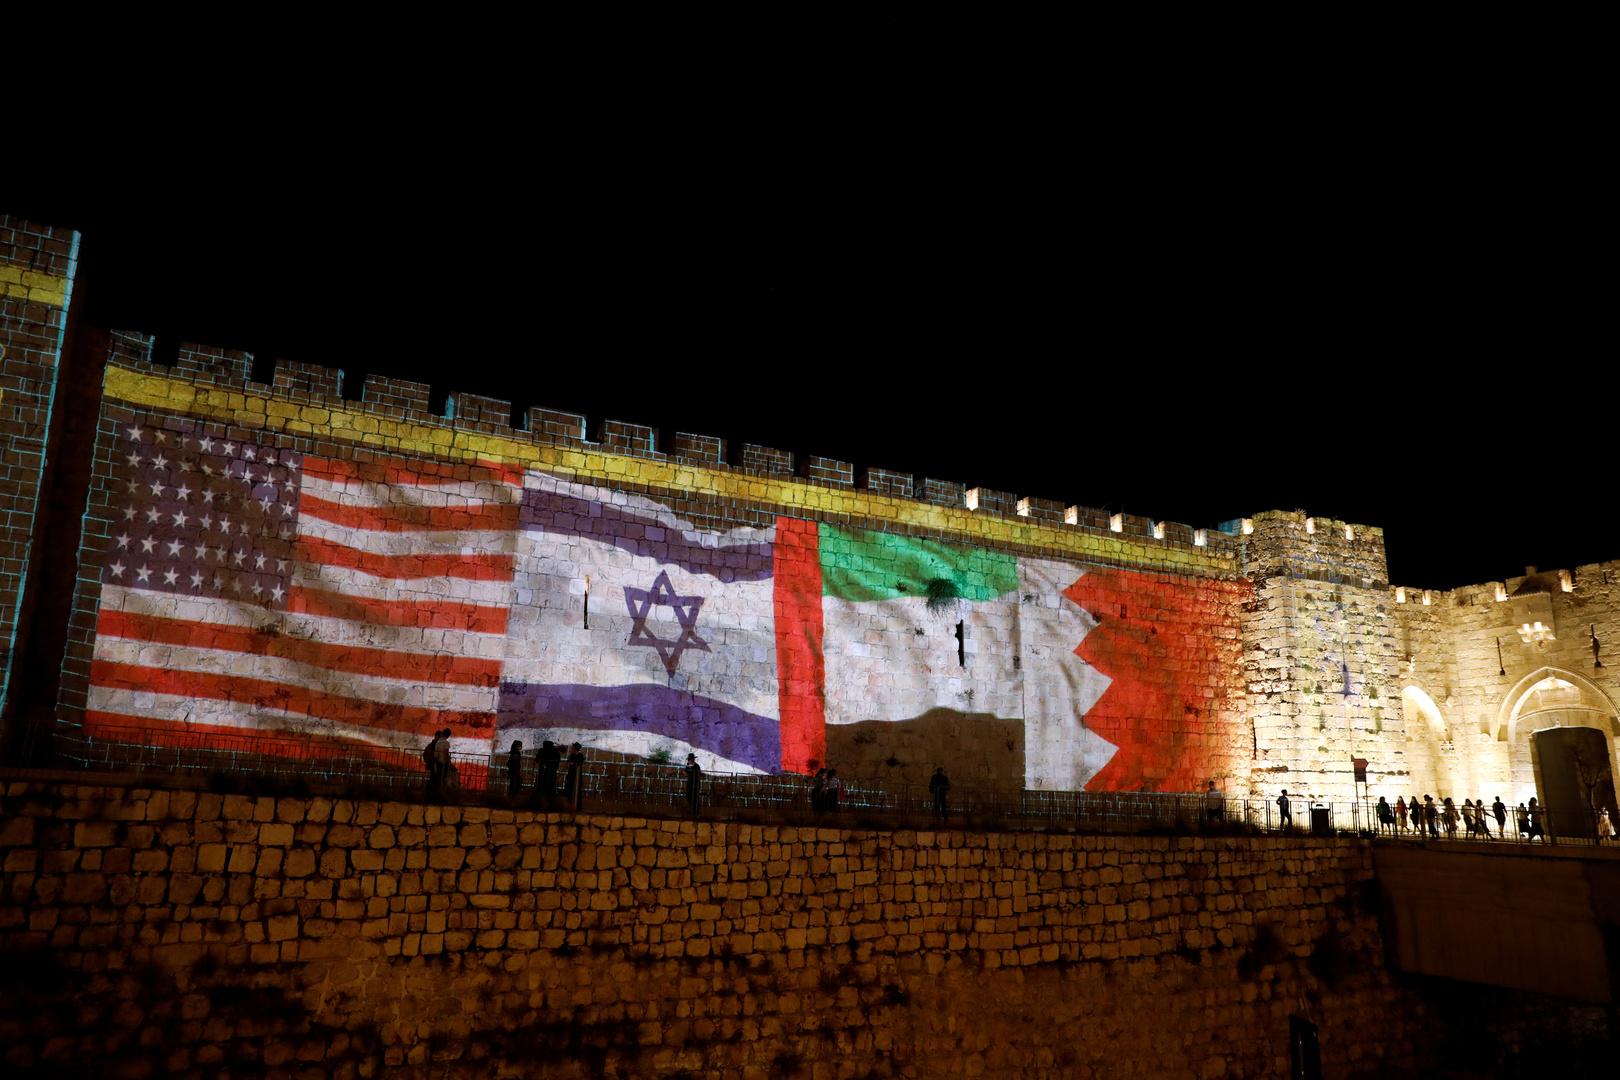 Israeli opinion: Trump injury Bkorona hampers normalization with 5 Arab countries